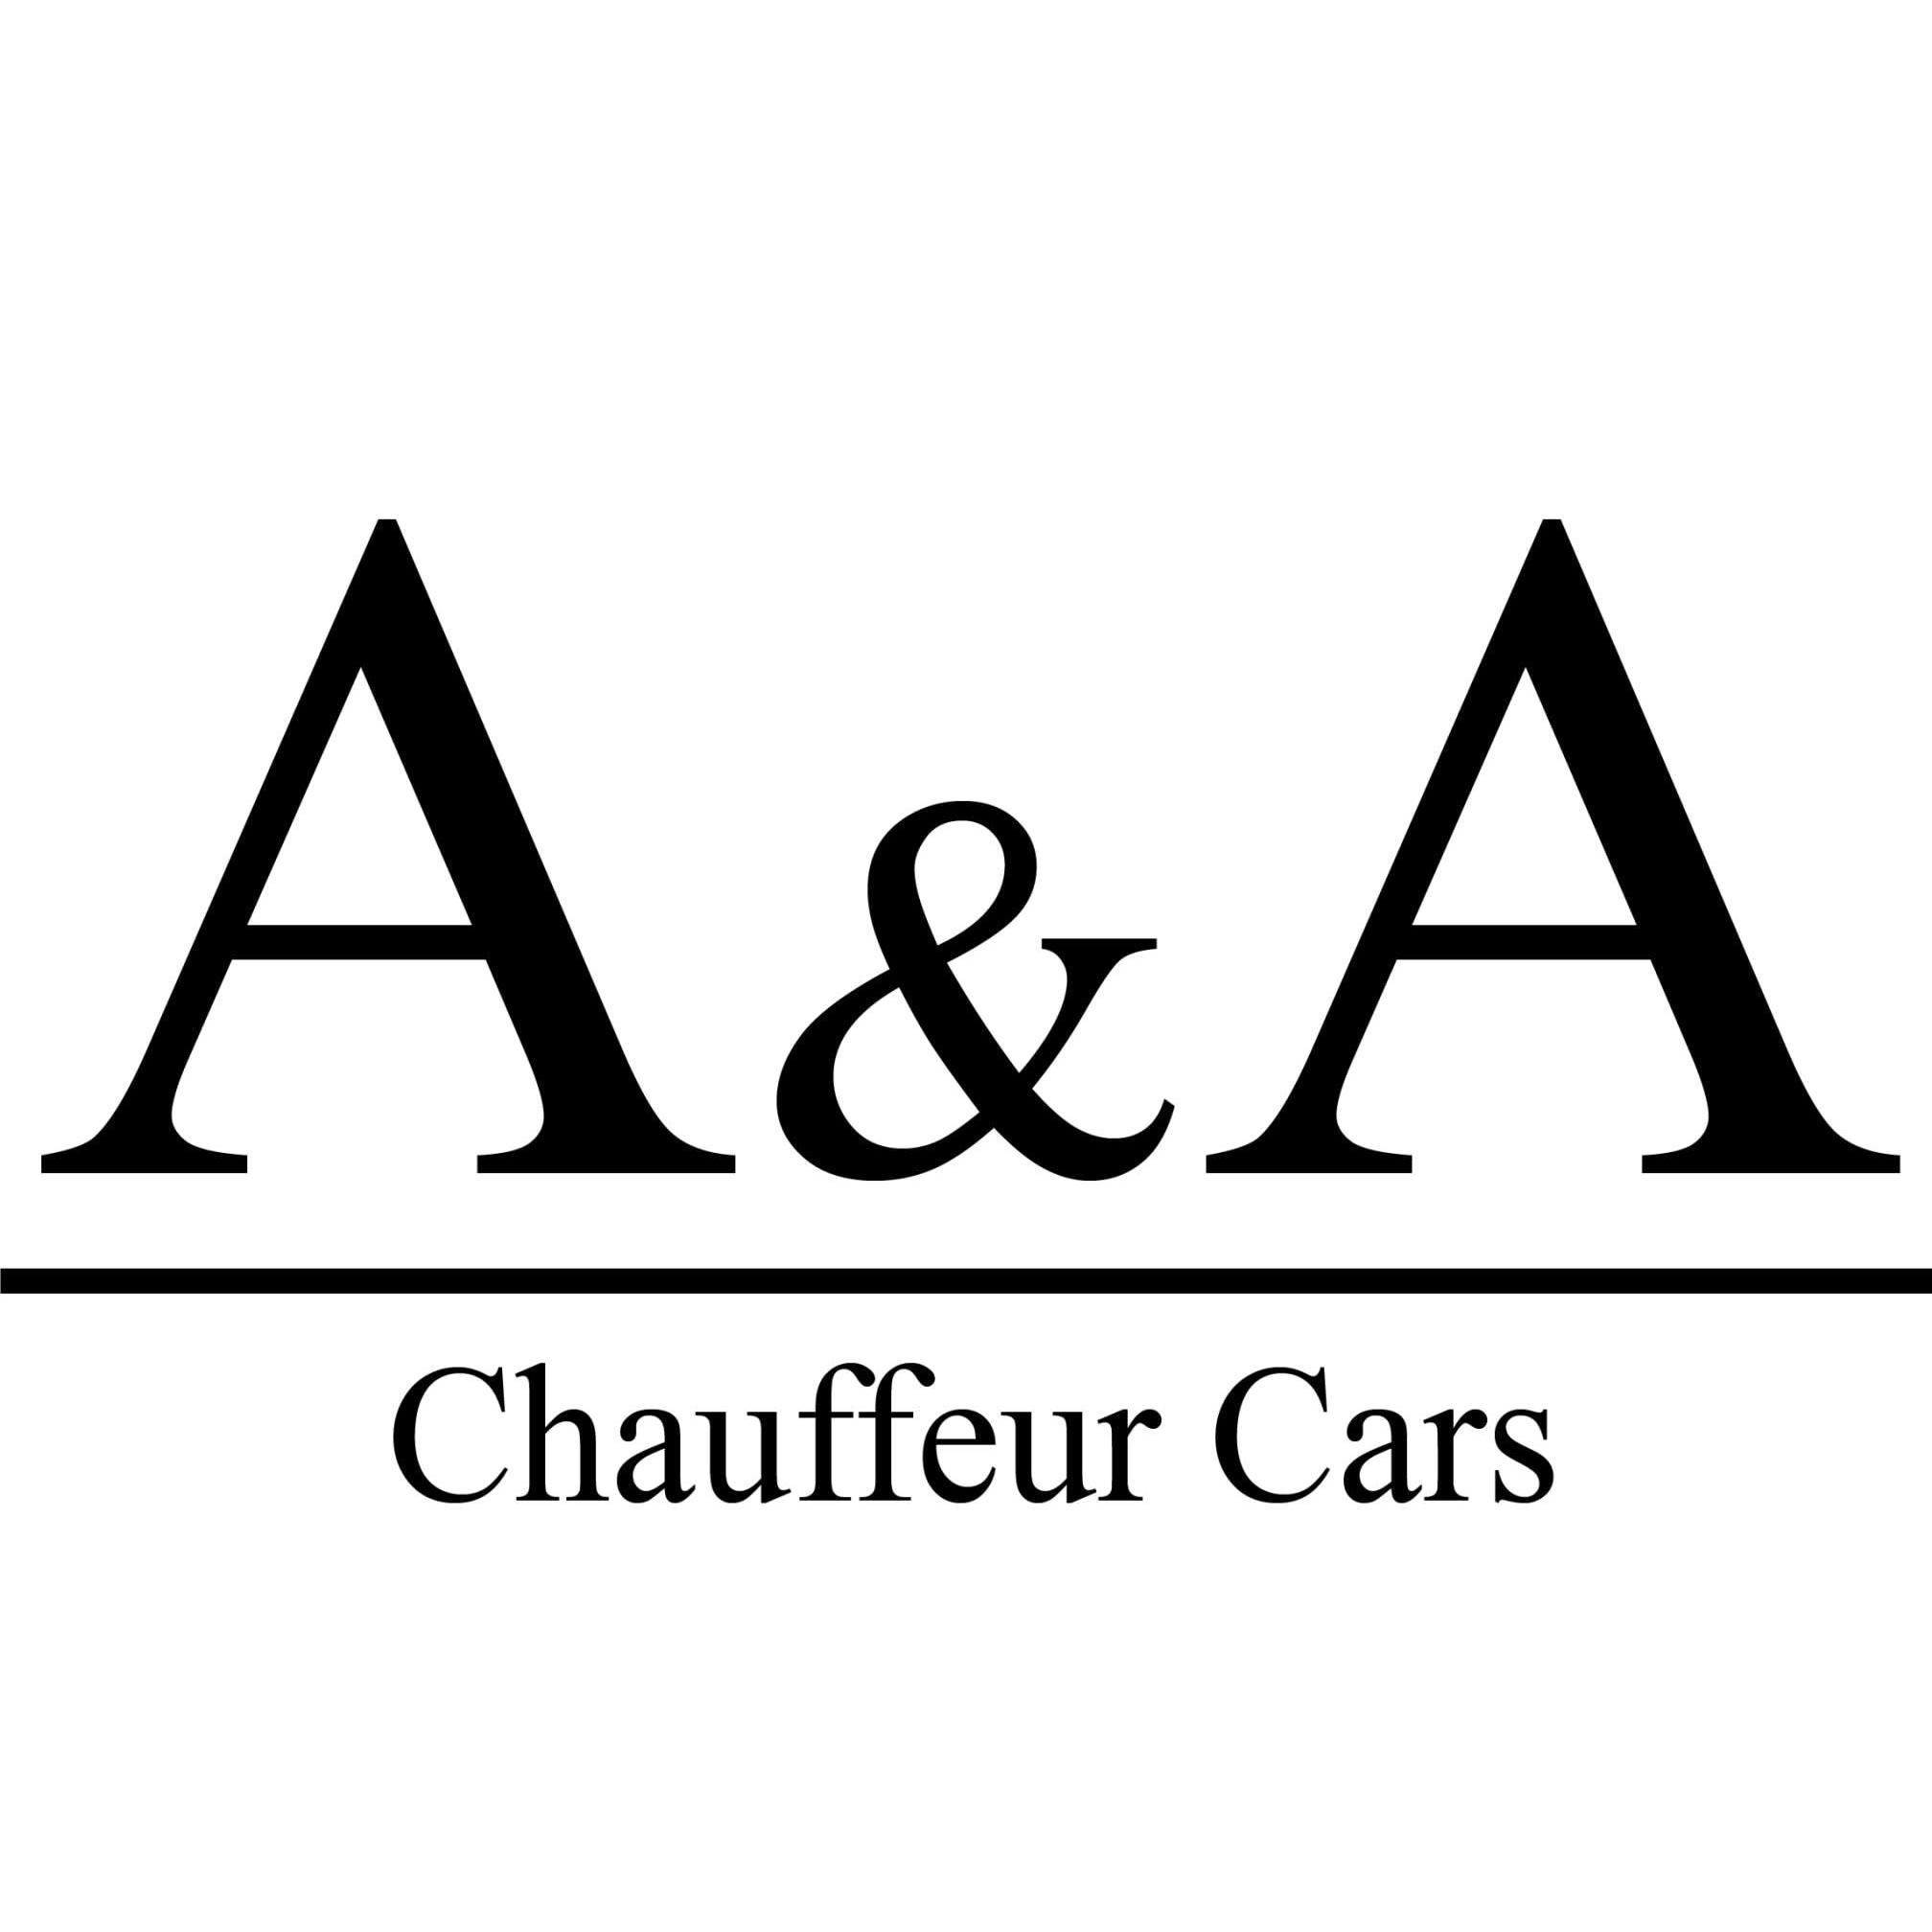 A&A Chauffeur Cars - Basingstoke, Hampshire  - 01256 976888 | ShowMeLocal.com